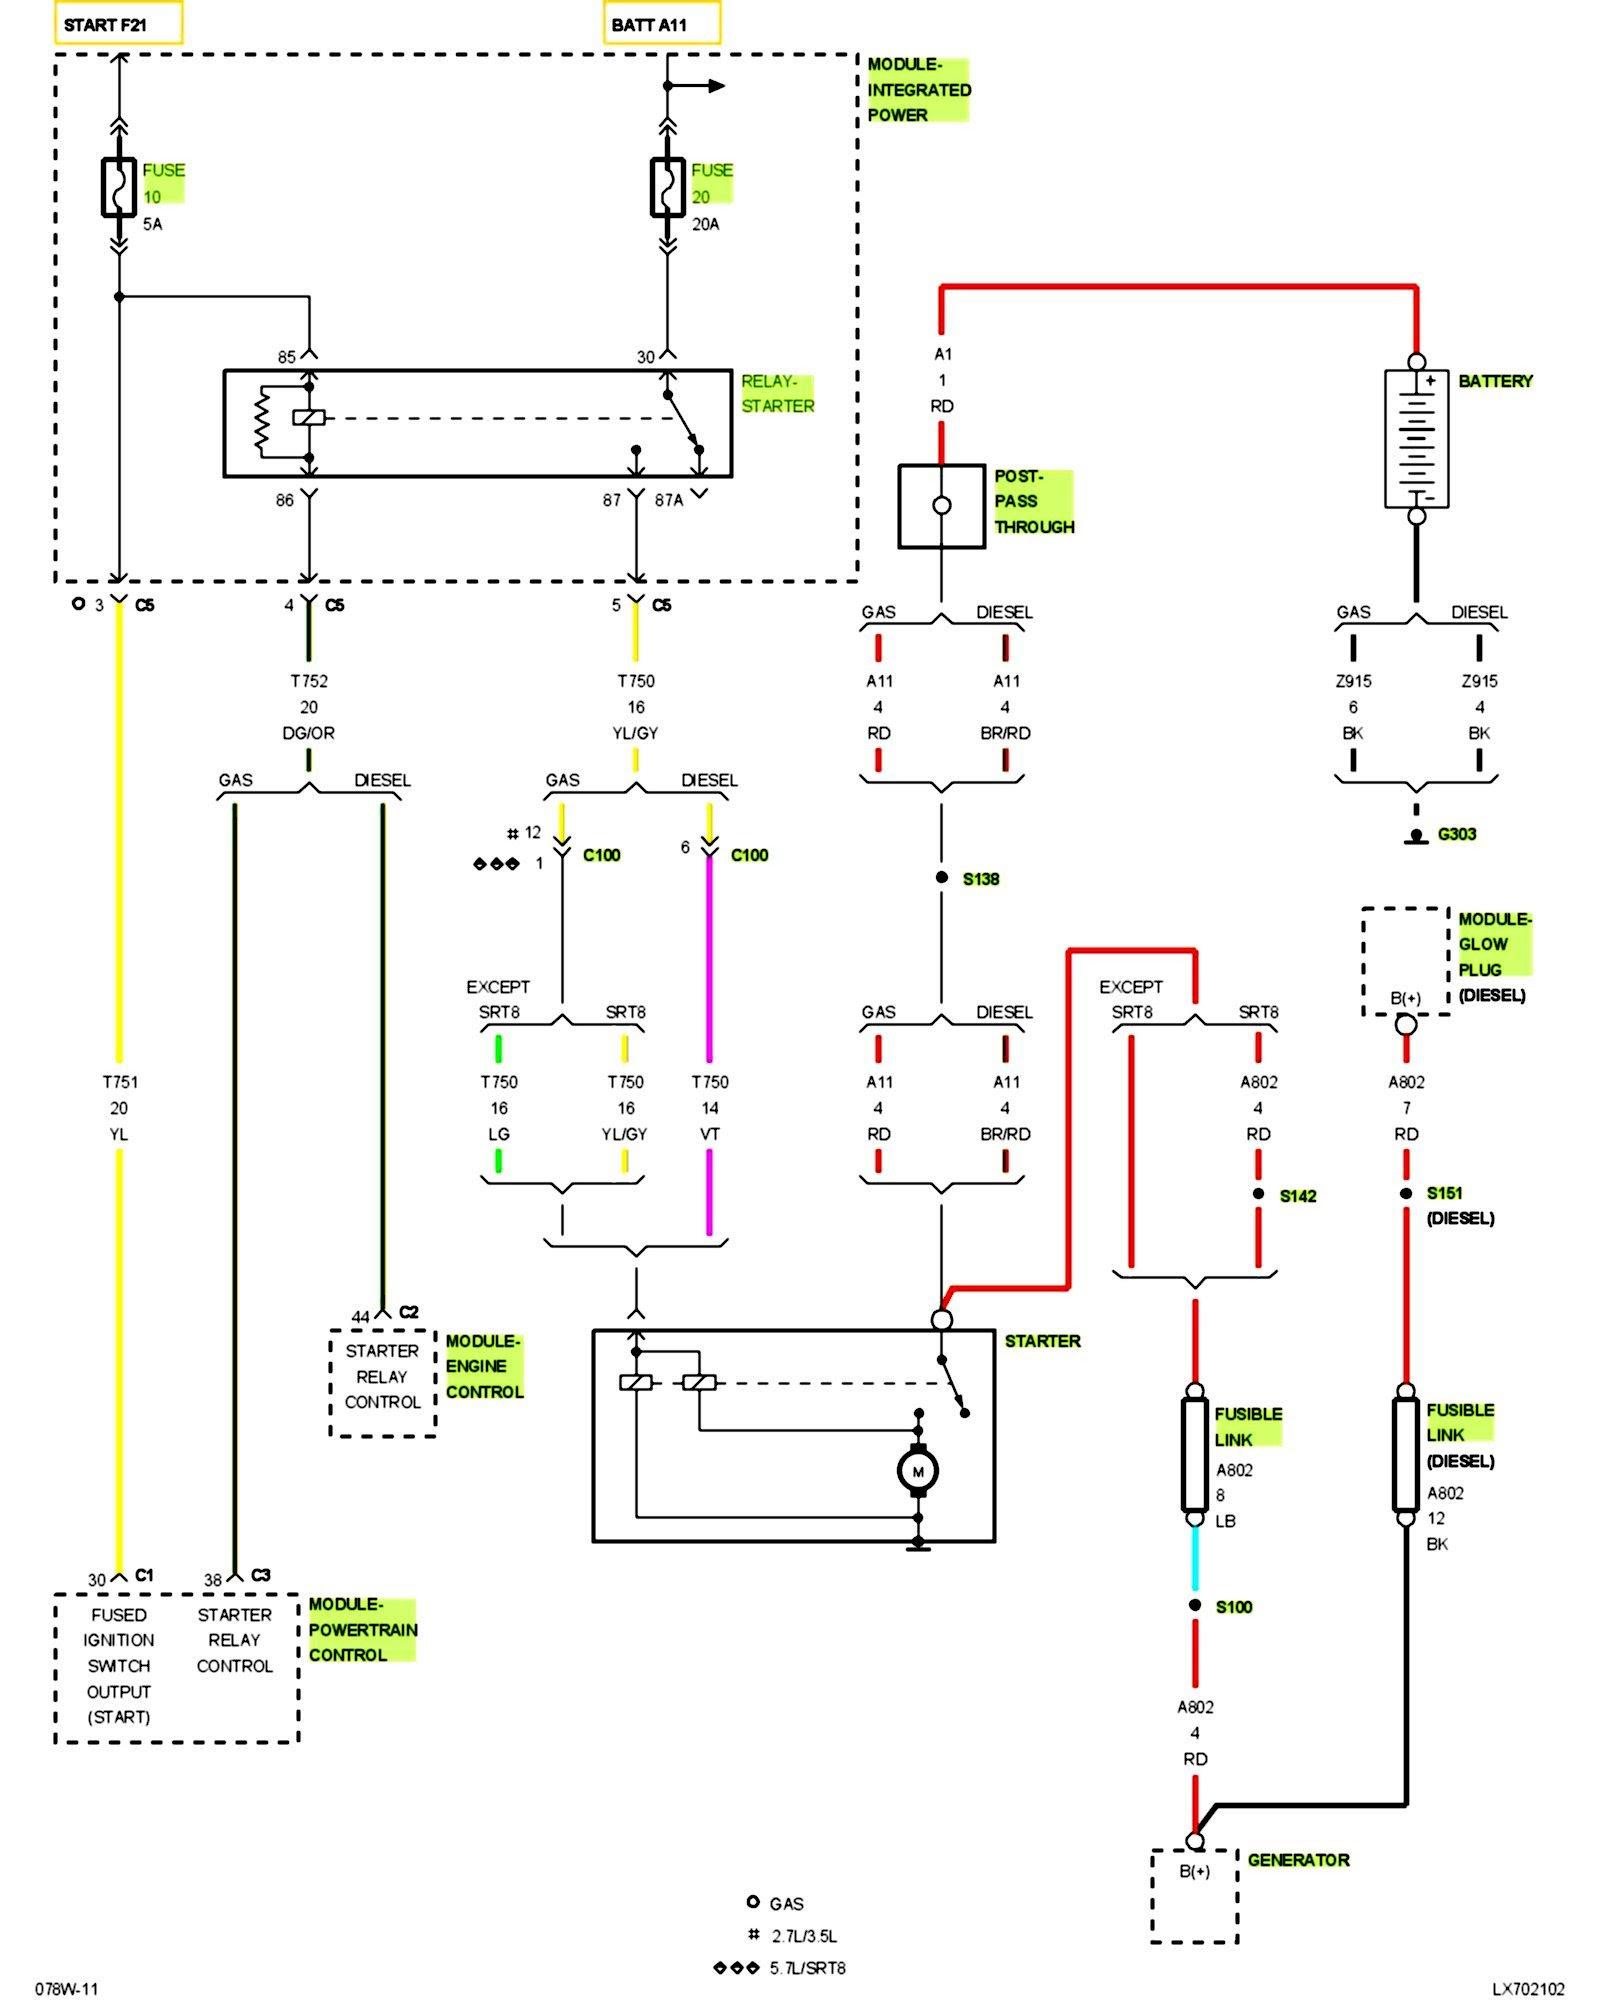 2002 chrysler pt cruiser ac wiring diagram - 120 force engine diagram -  wiring-car-auto7.bmw1992.warmi.fr  wiring diagram resource